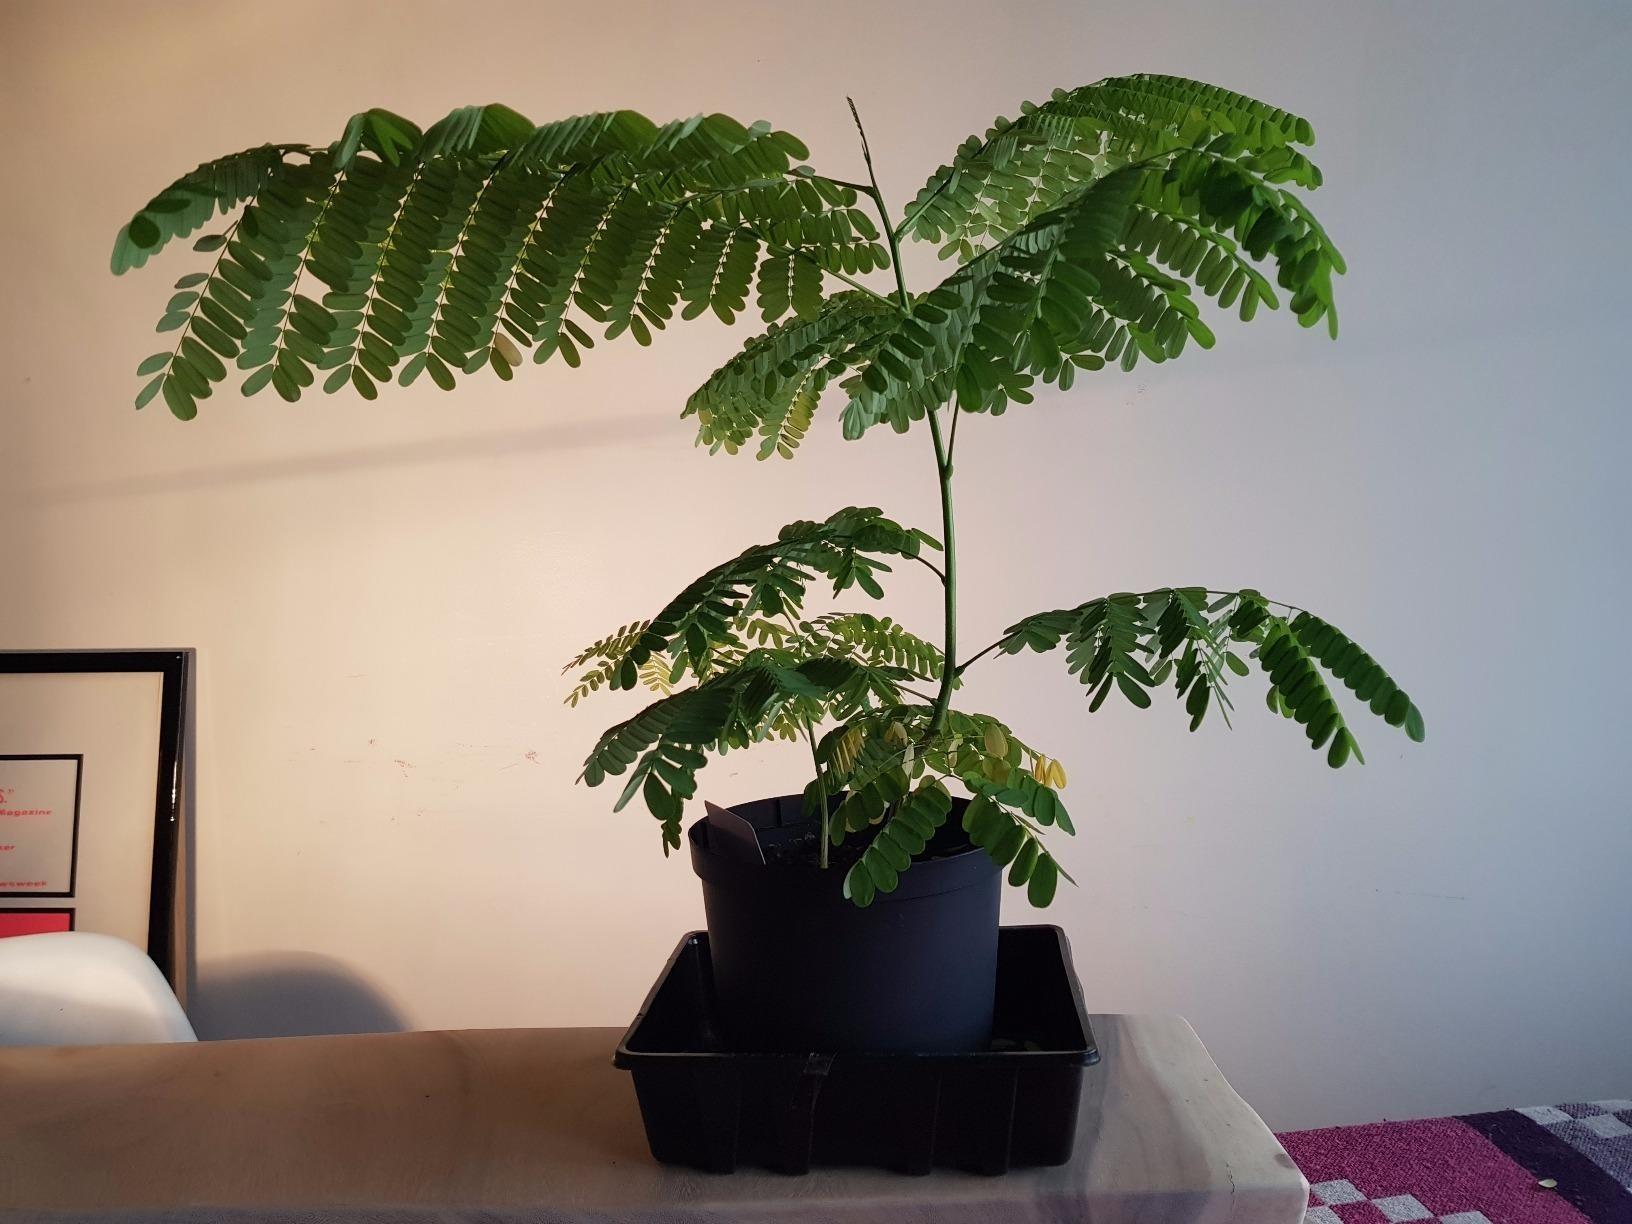 Reviewer photo of their thriving bonsai